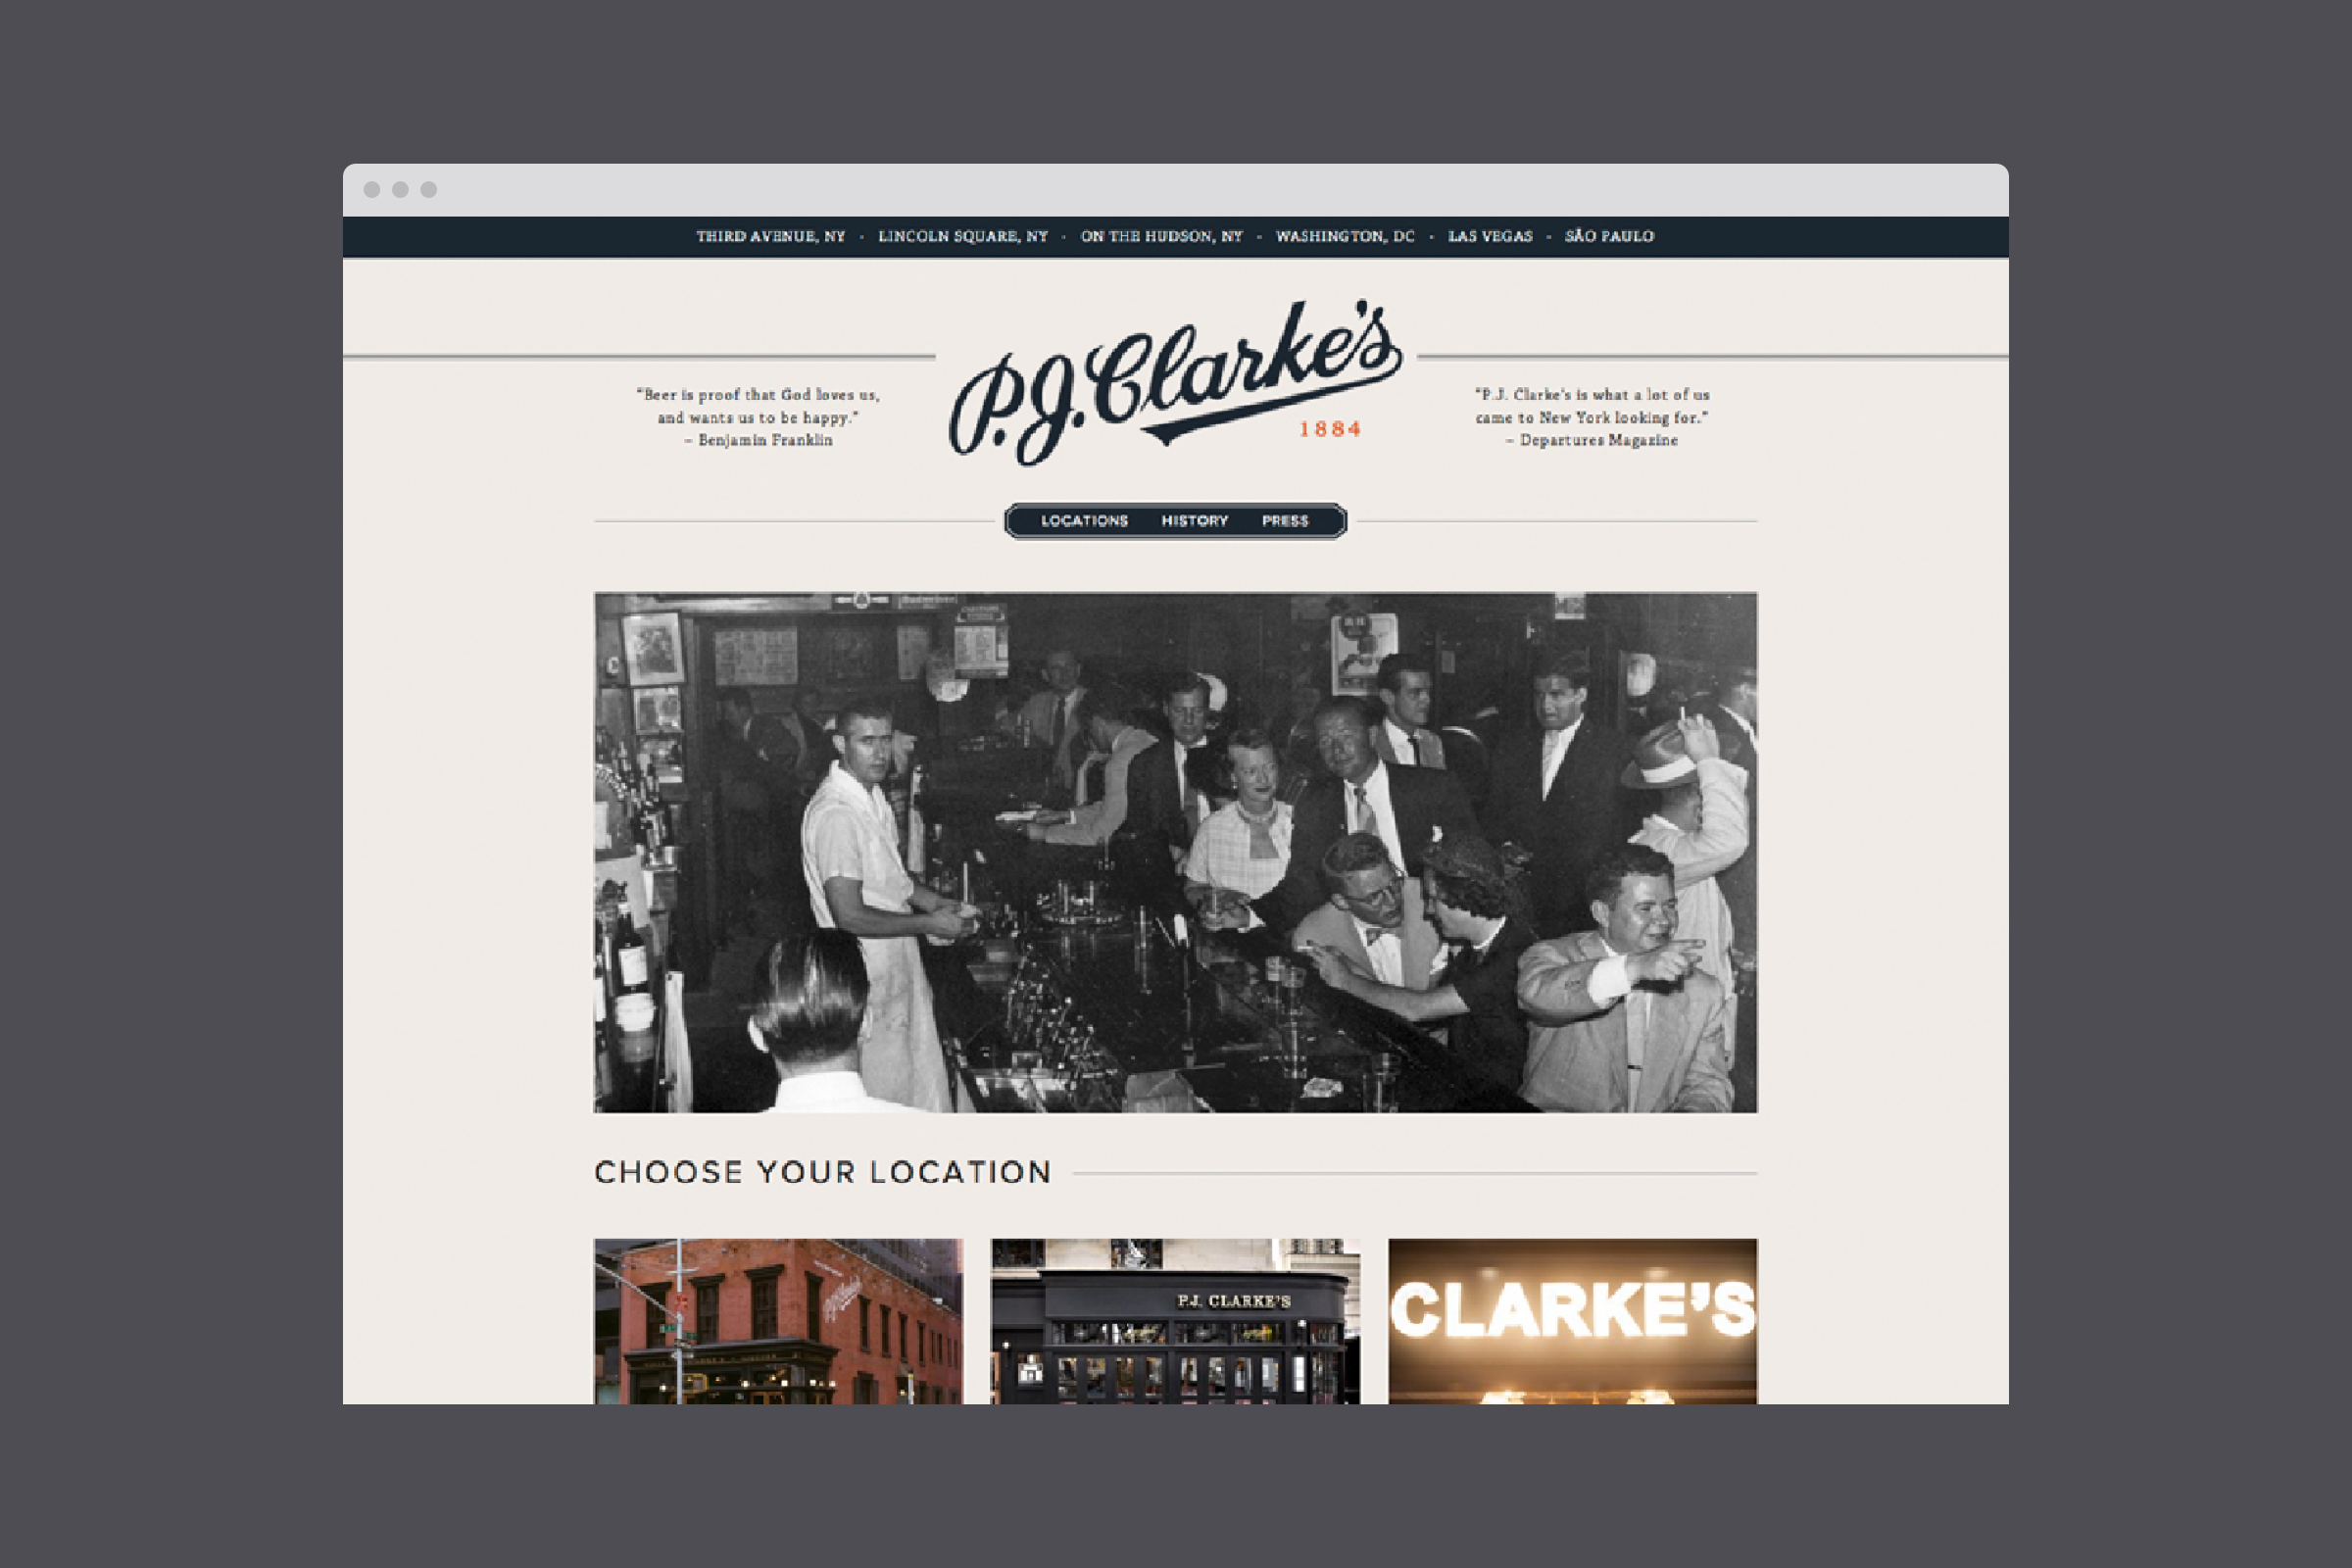 PJ-Clarkes-Website-1.jpg